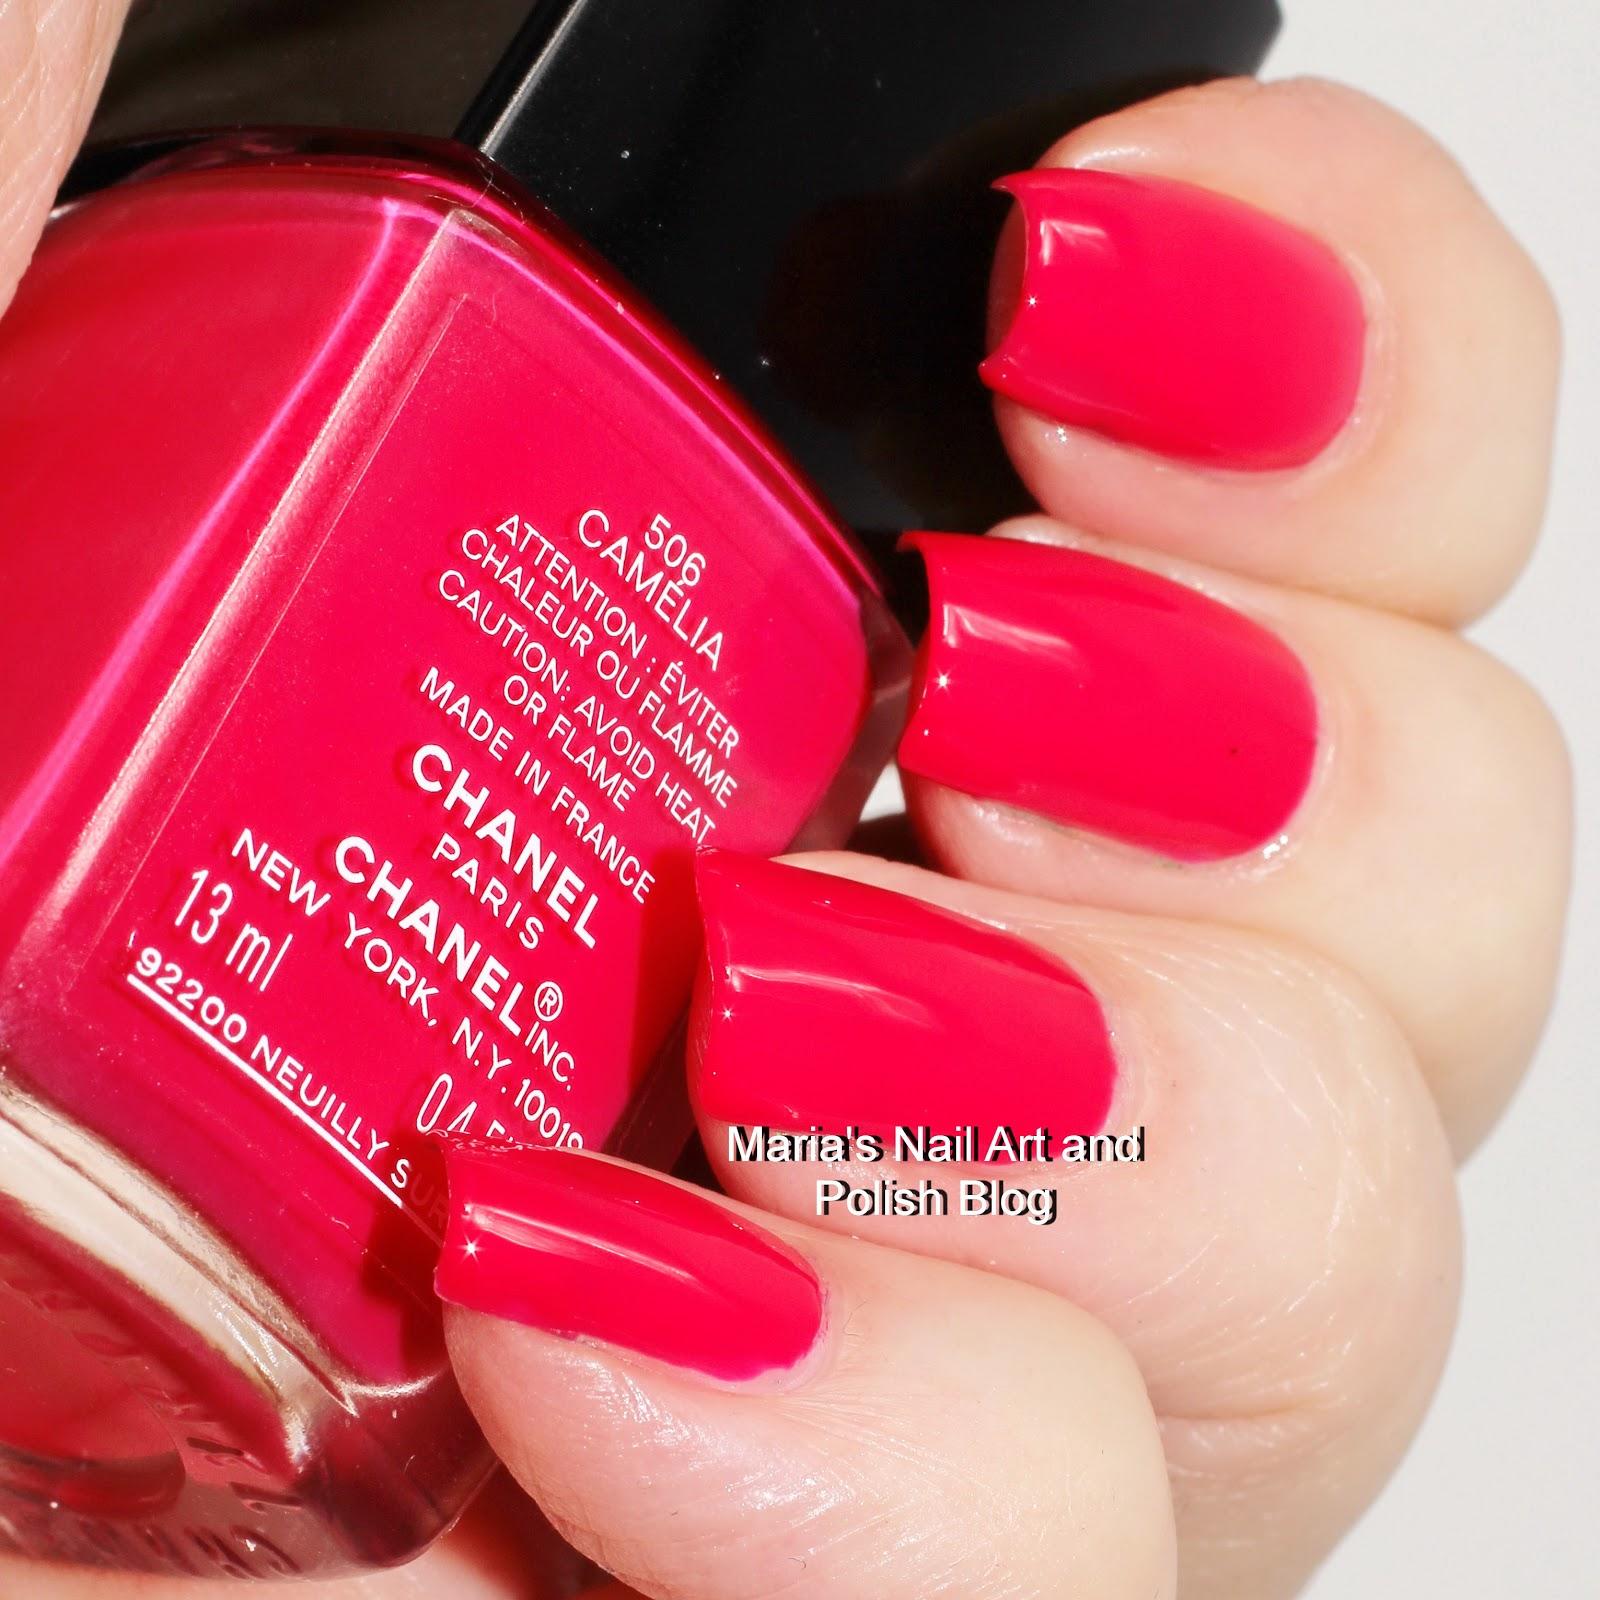 Marias Nail Art and Polish Blog: Chanel Camelia 506 swatches